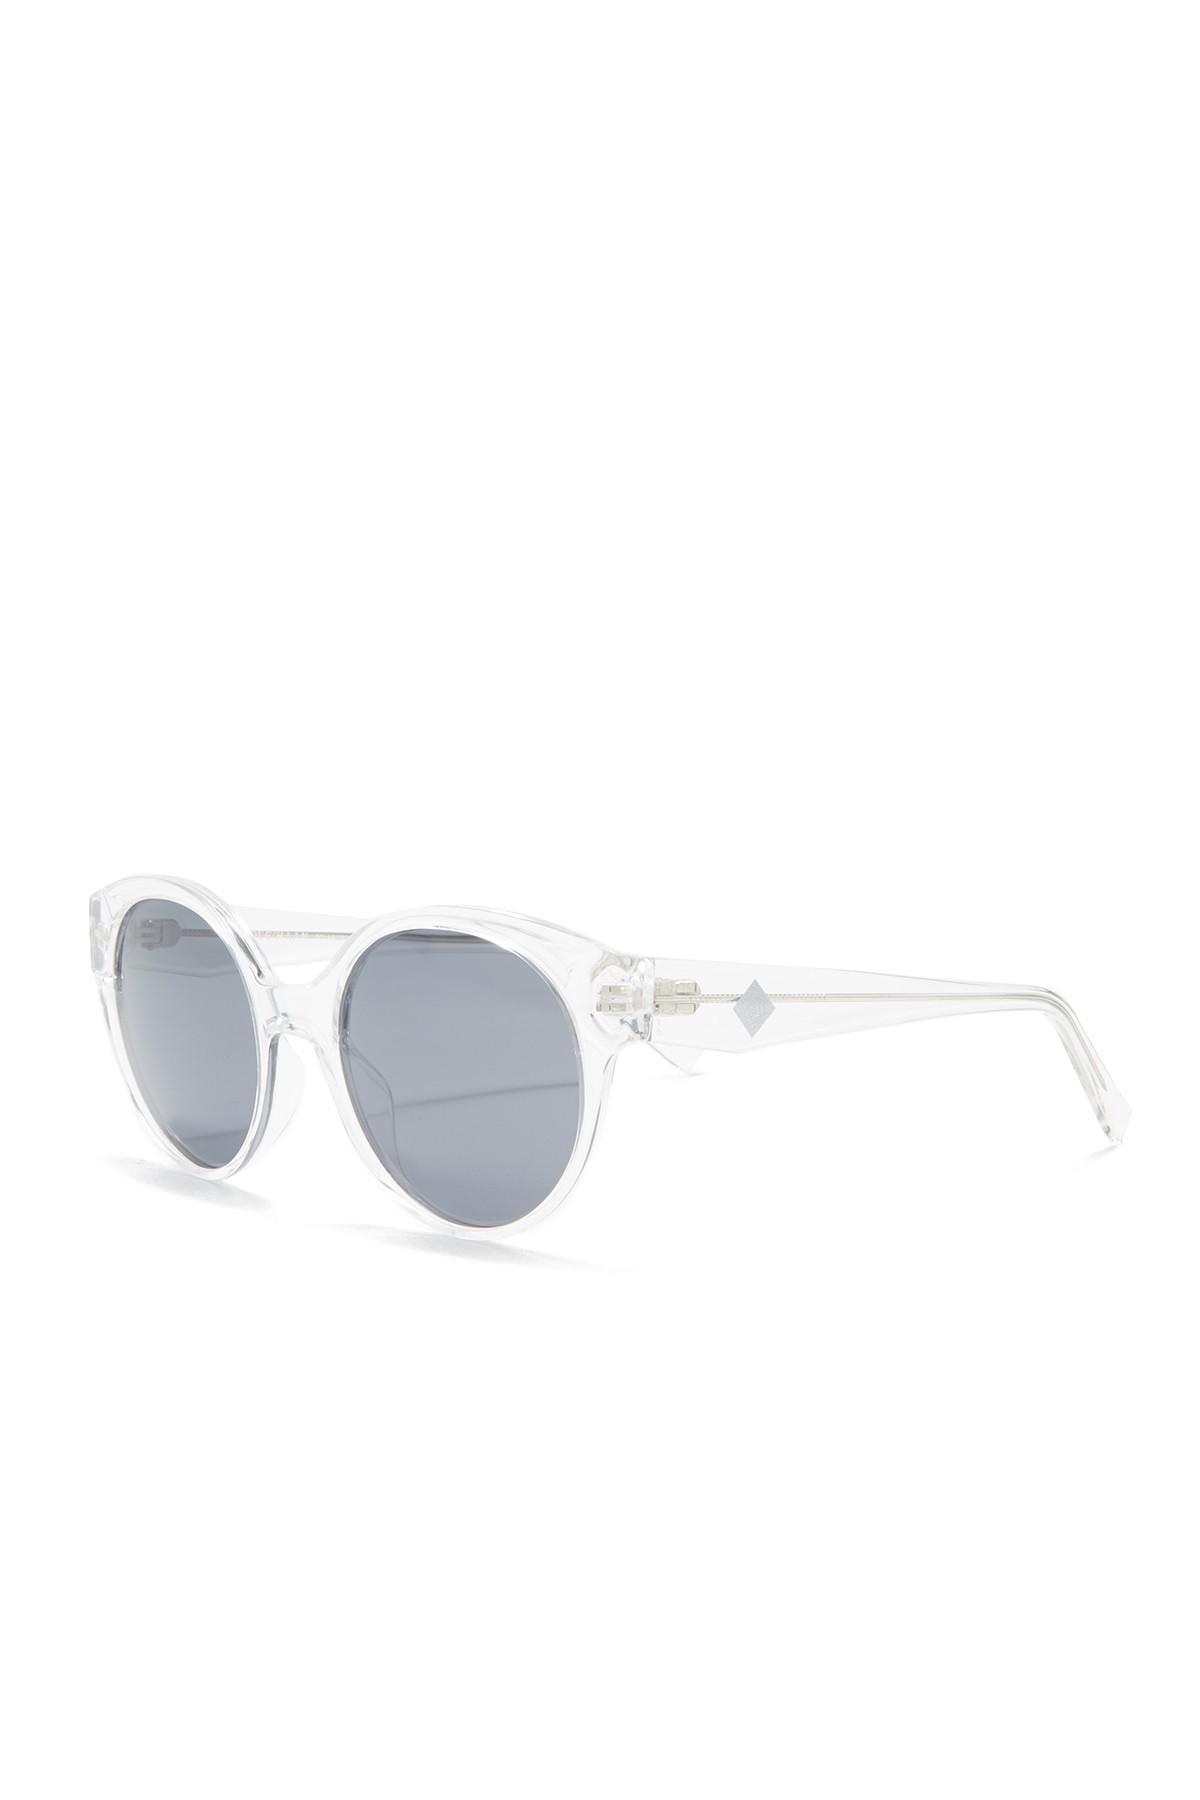 36b7c3a47e62 Cole Haan - Multicolor Polarized 52mm Round Sunglasses - Lyst. View  fullscreen